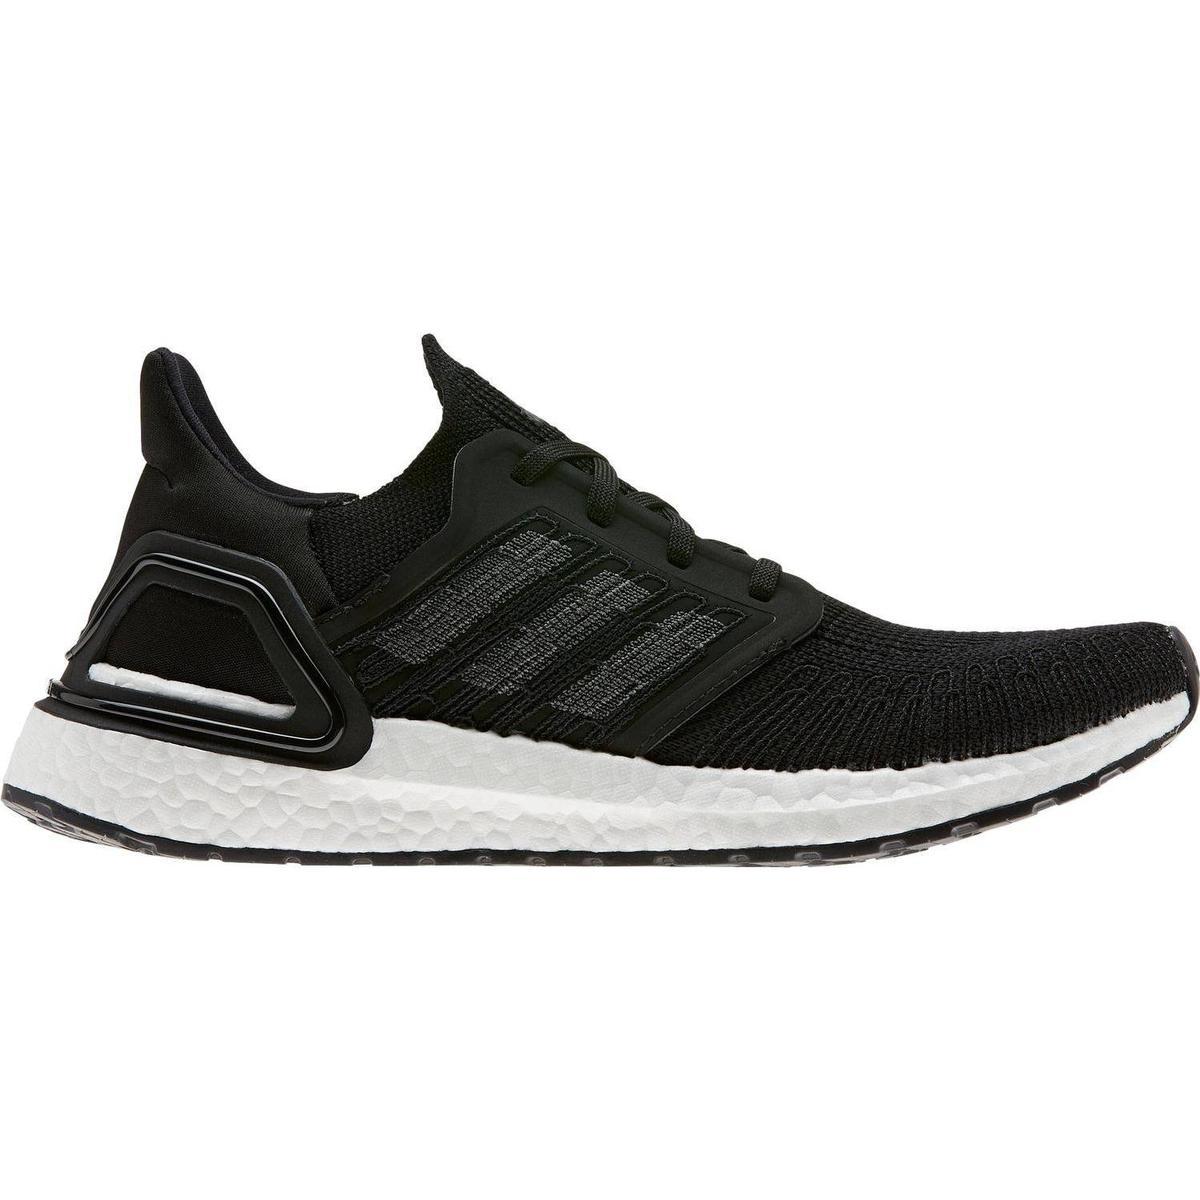 Adidas Löparskor (1000+ produkter) hos PriceRunner • Se